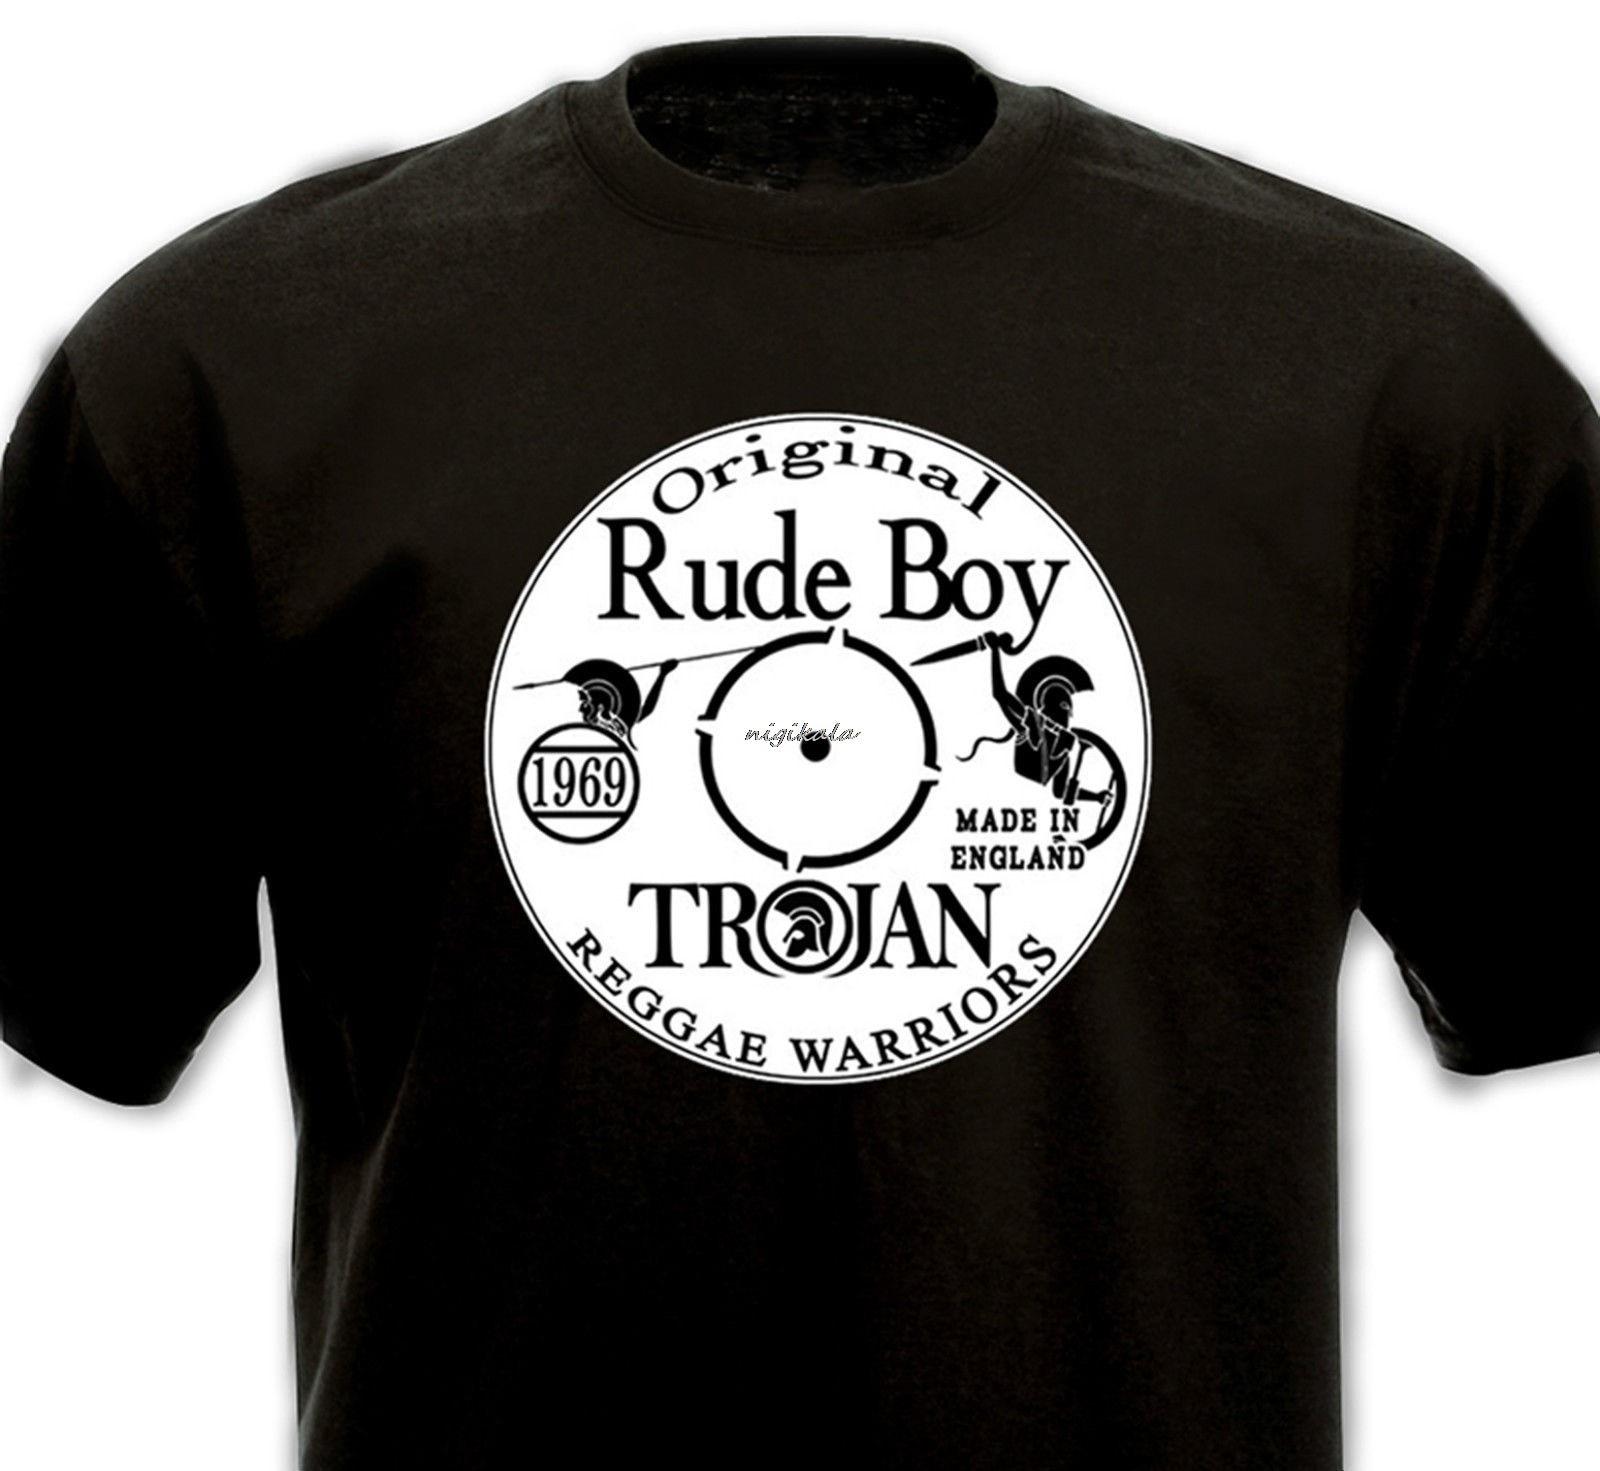 T-SHIRT Original Rude Boy - Ska Reggae Dub Vinyl Trojan Studio 1 Coxsone - 1969 Low Price Round Neck Men Tees shirts